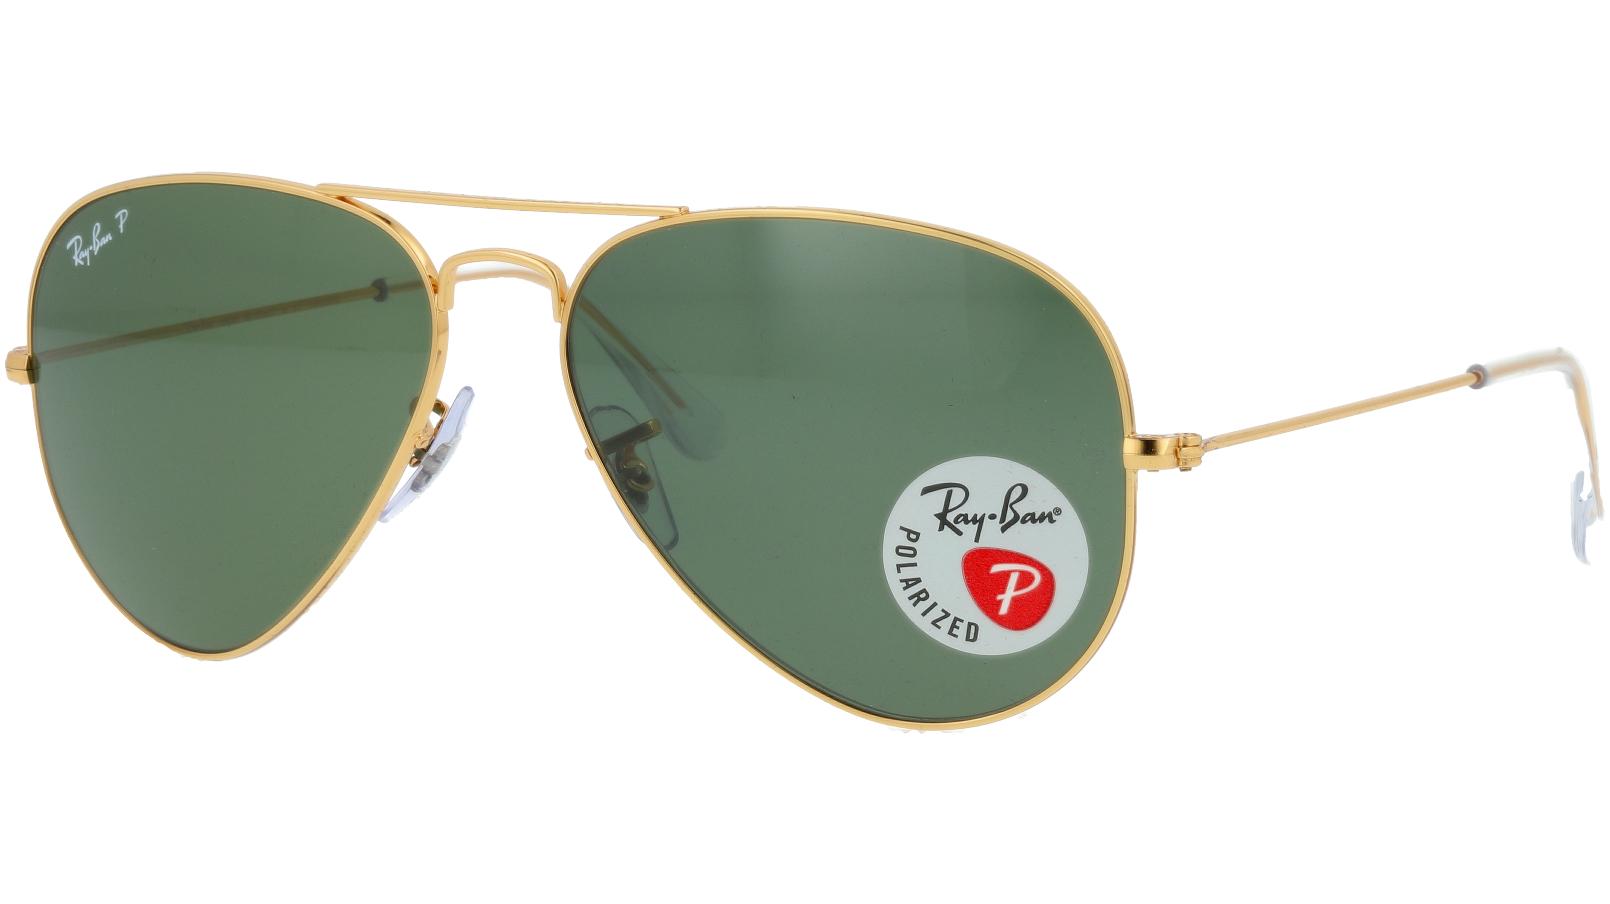 Ray-Ban RB3025 001/58 58 Arista Polarized Sunglasses